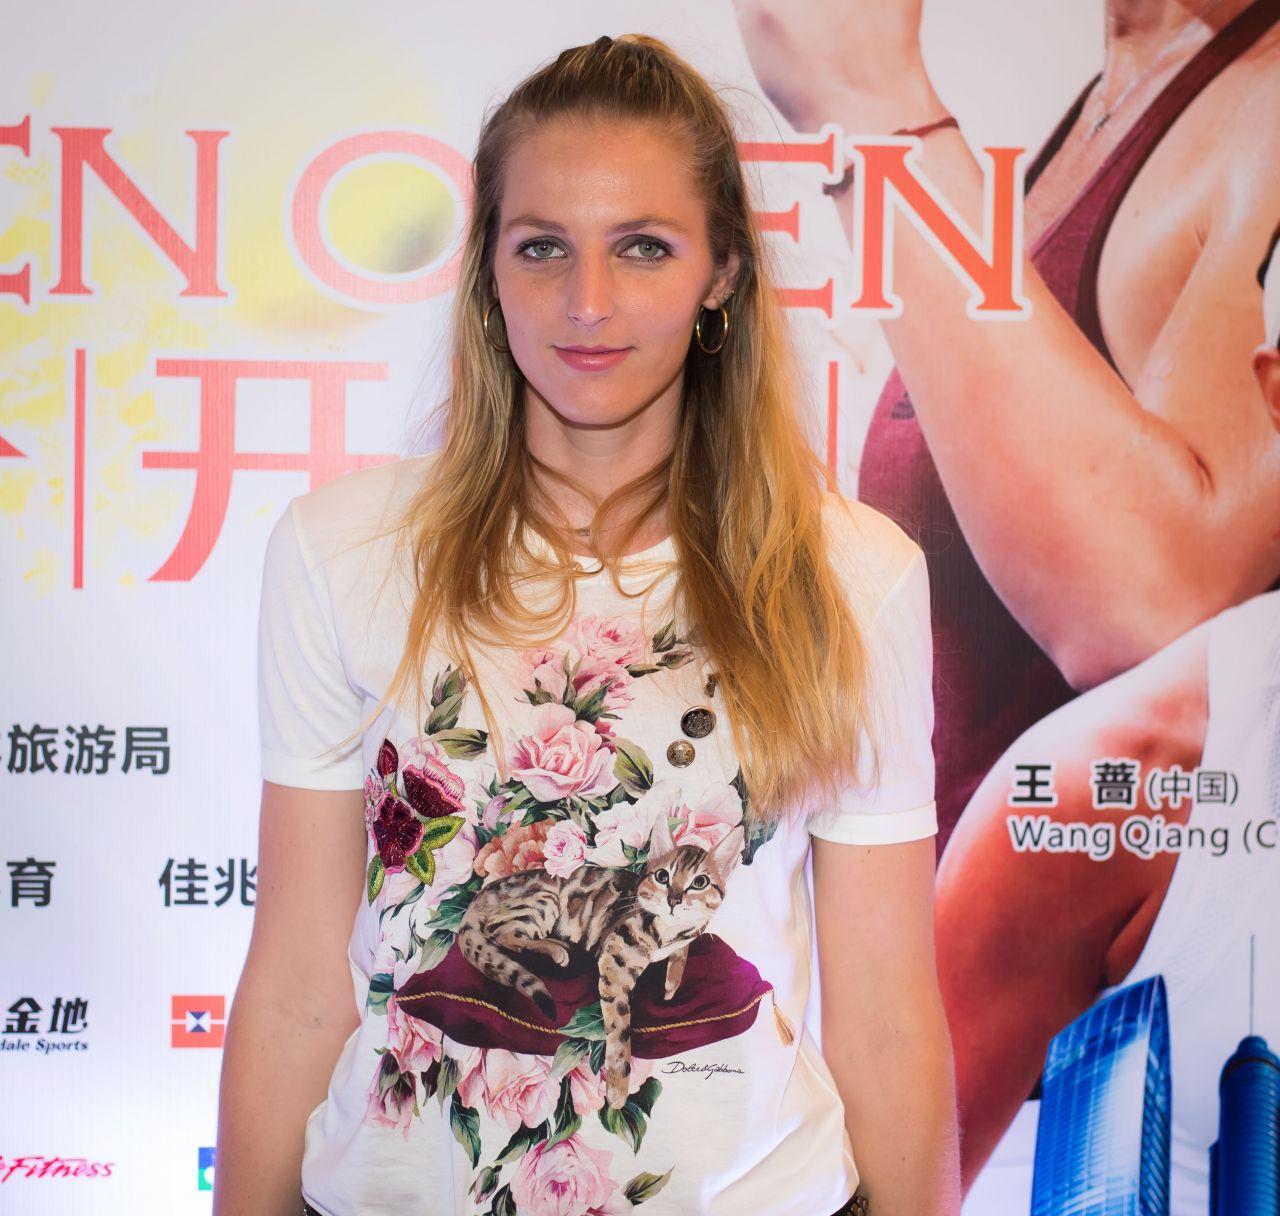 Kristyna Pliskova – Players Party of the 2018 Shenzen Open WTA International Open